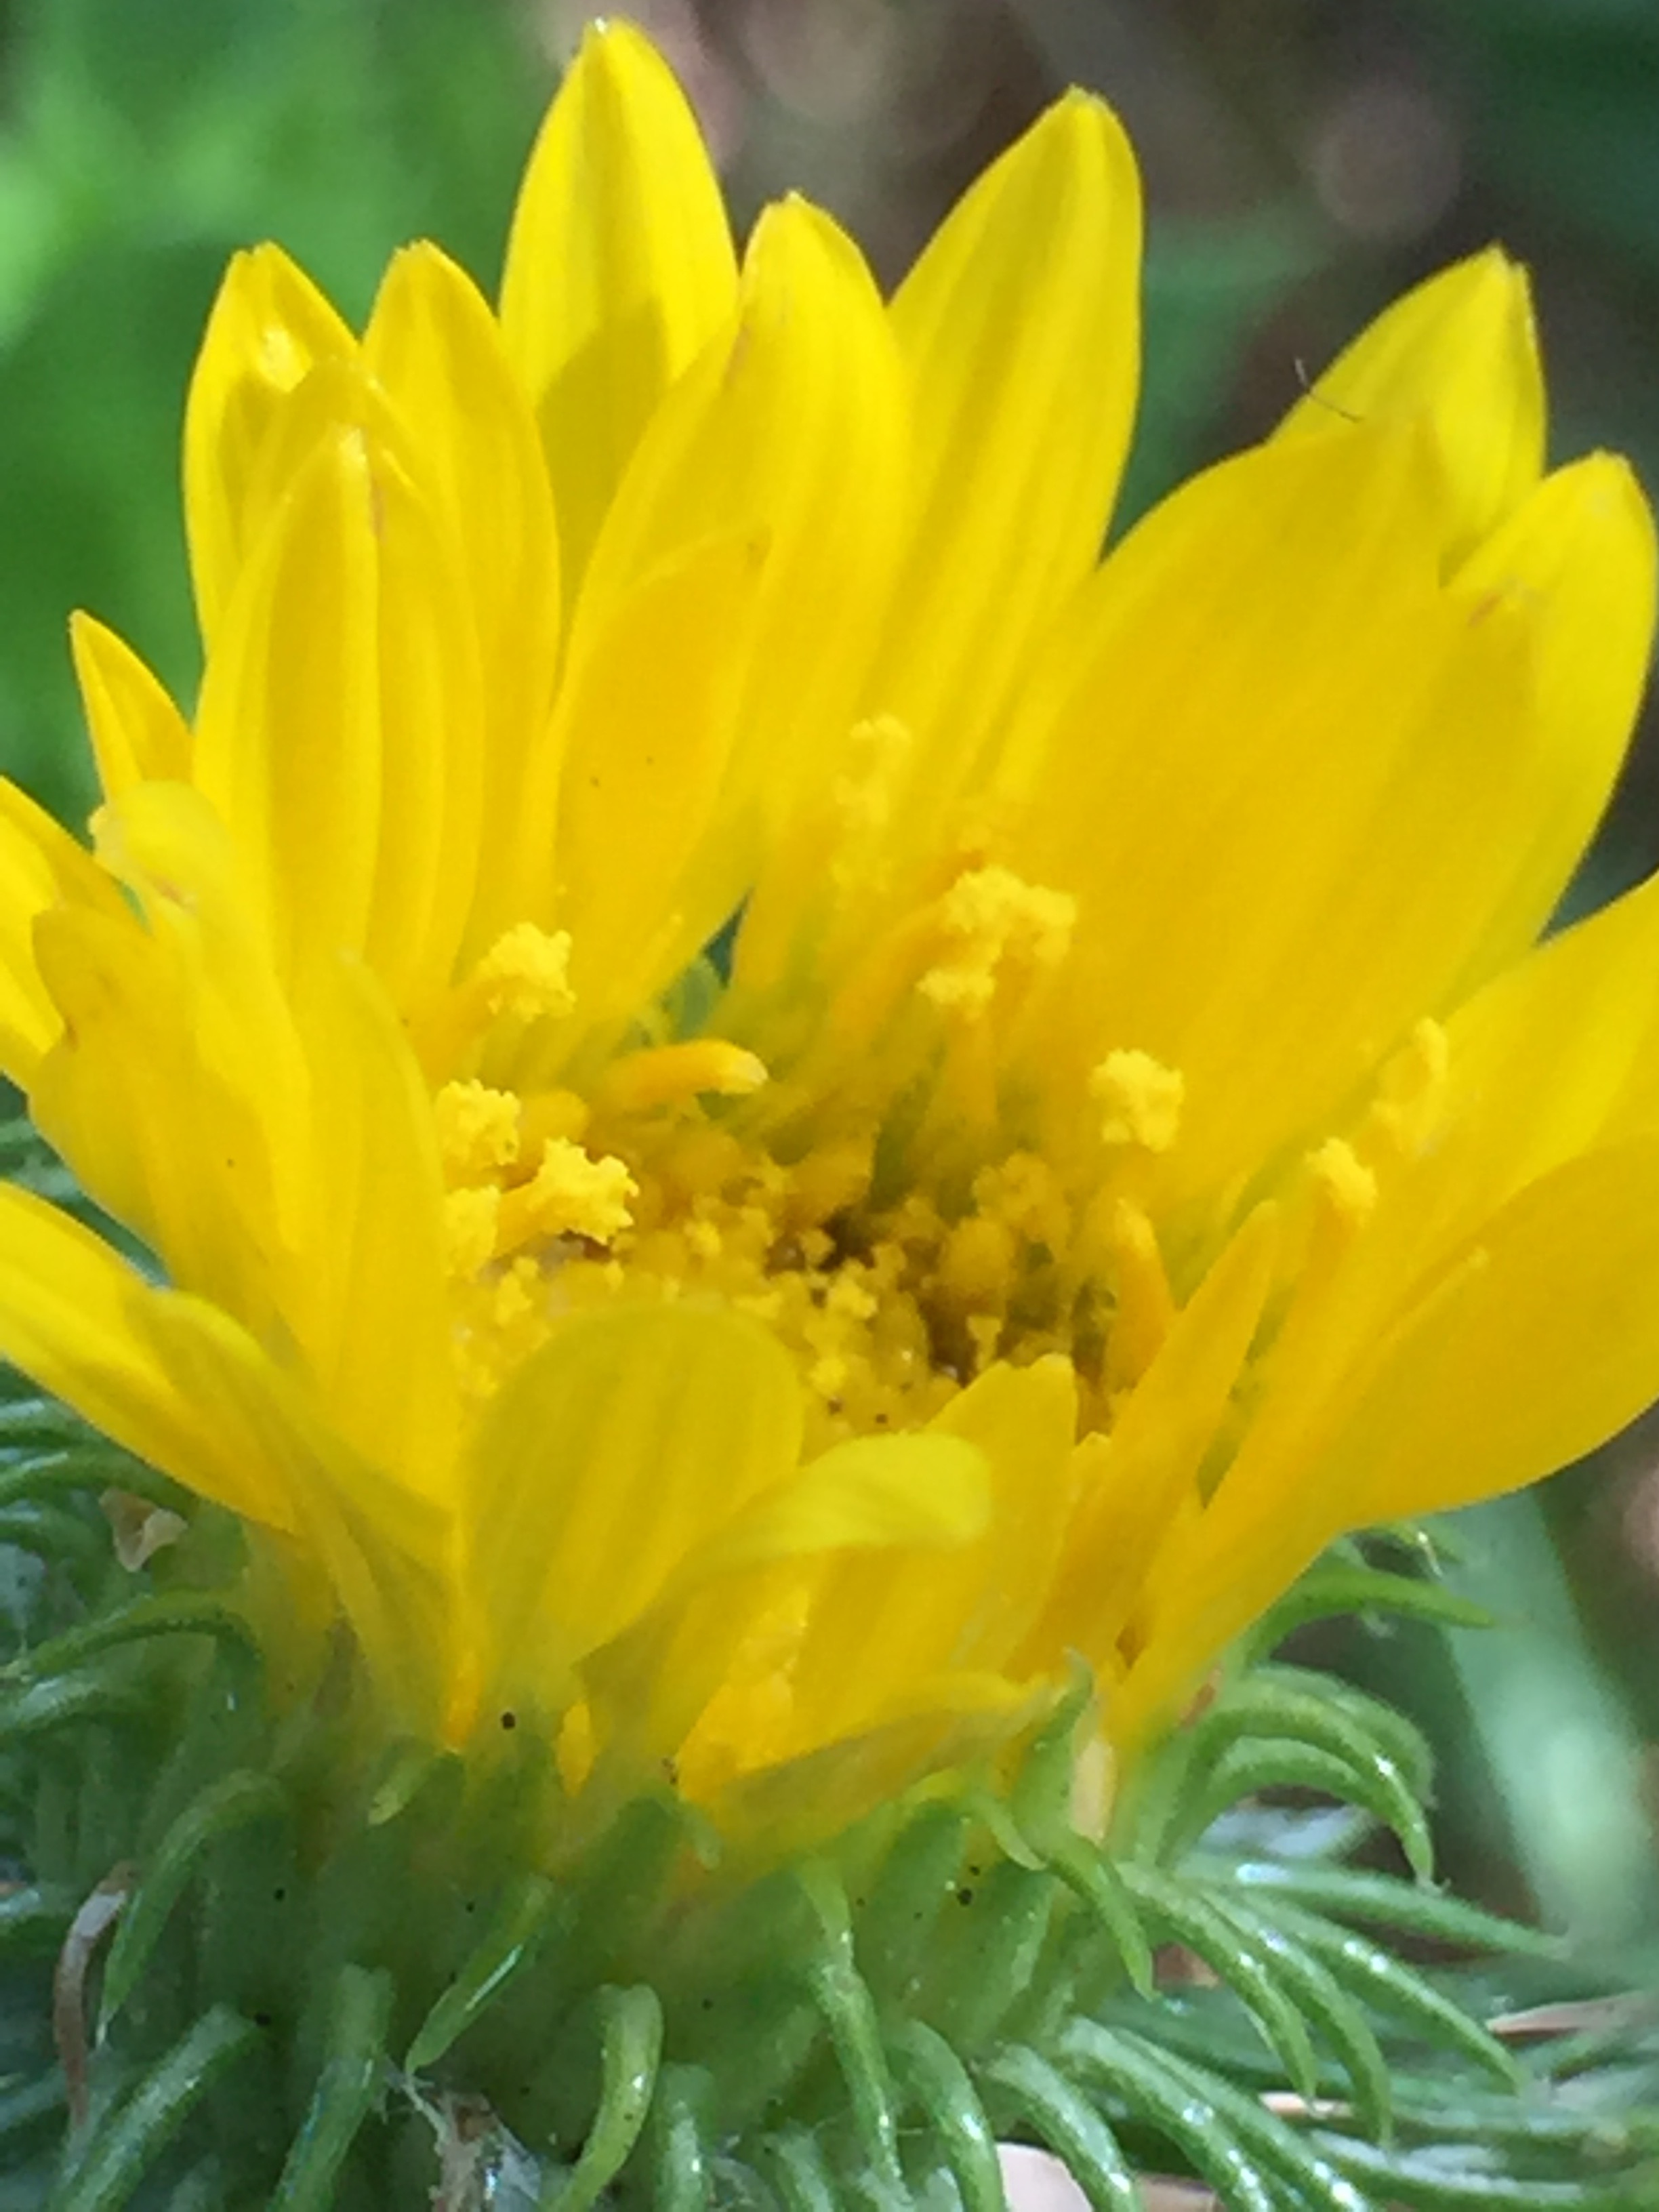 pollen grains in a California Sunflower